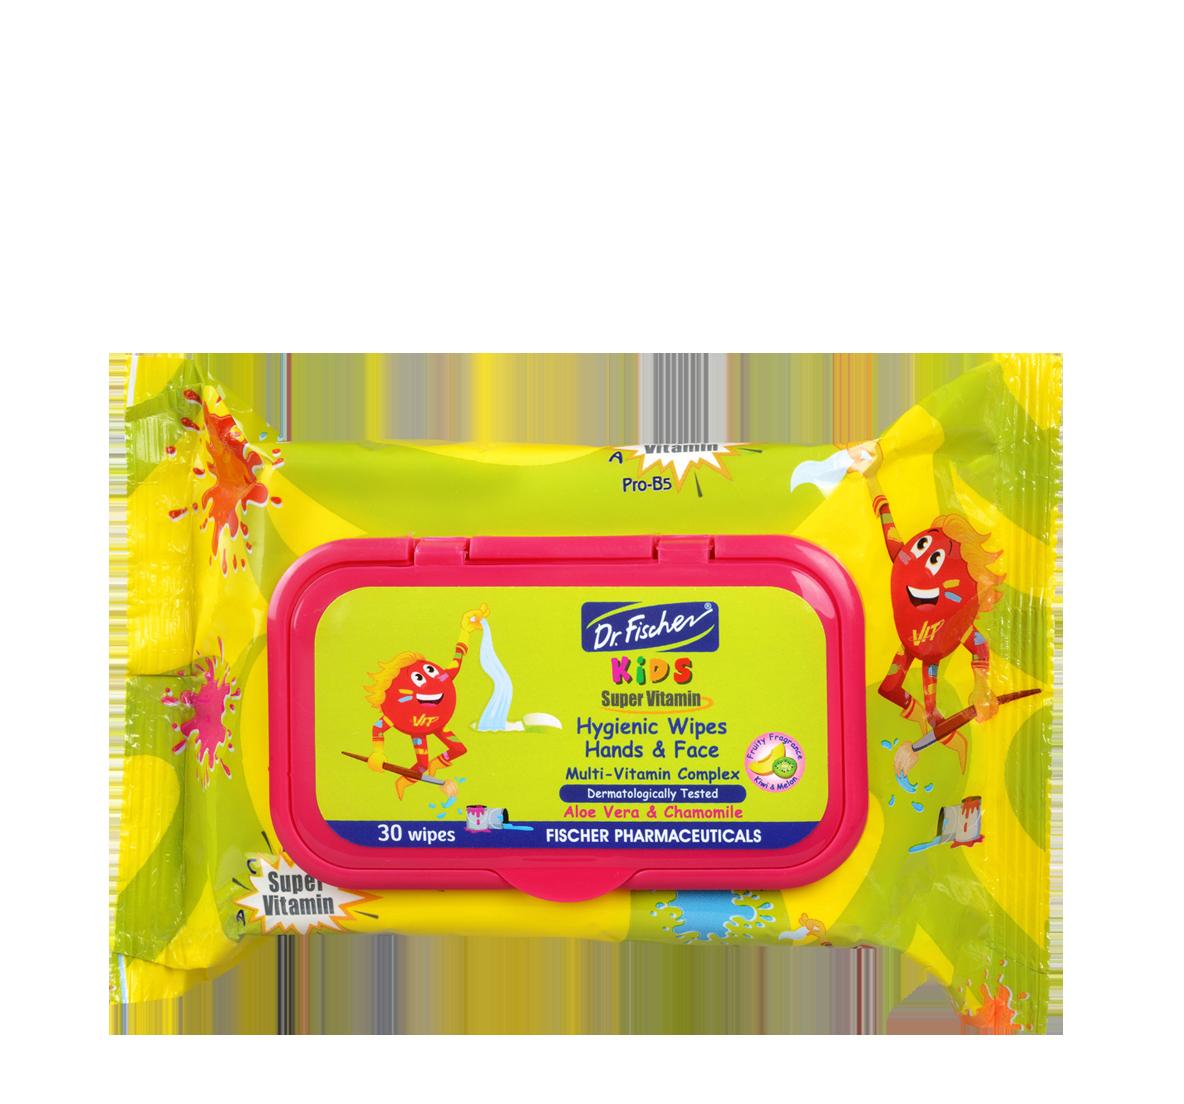 E_kids_hygienic_wipes_1184x1104